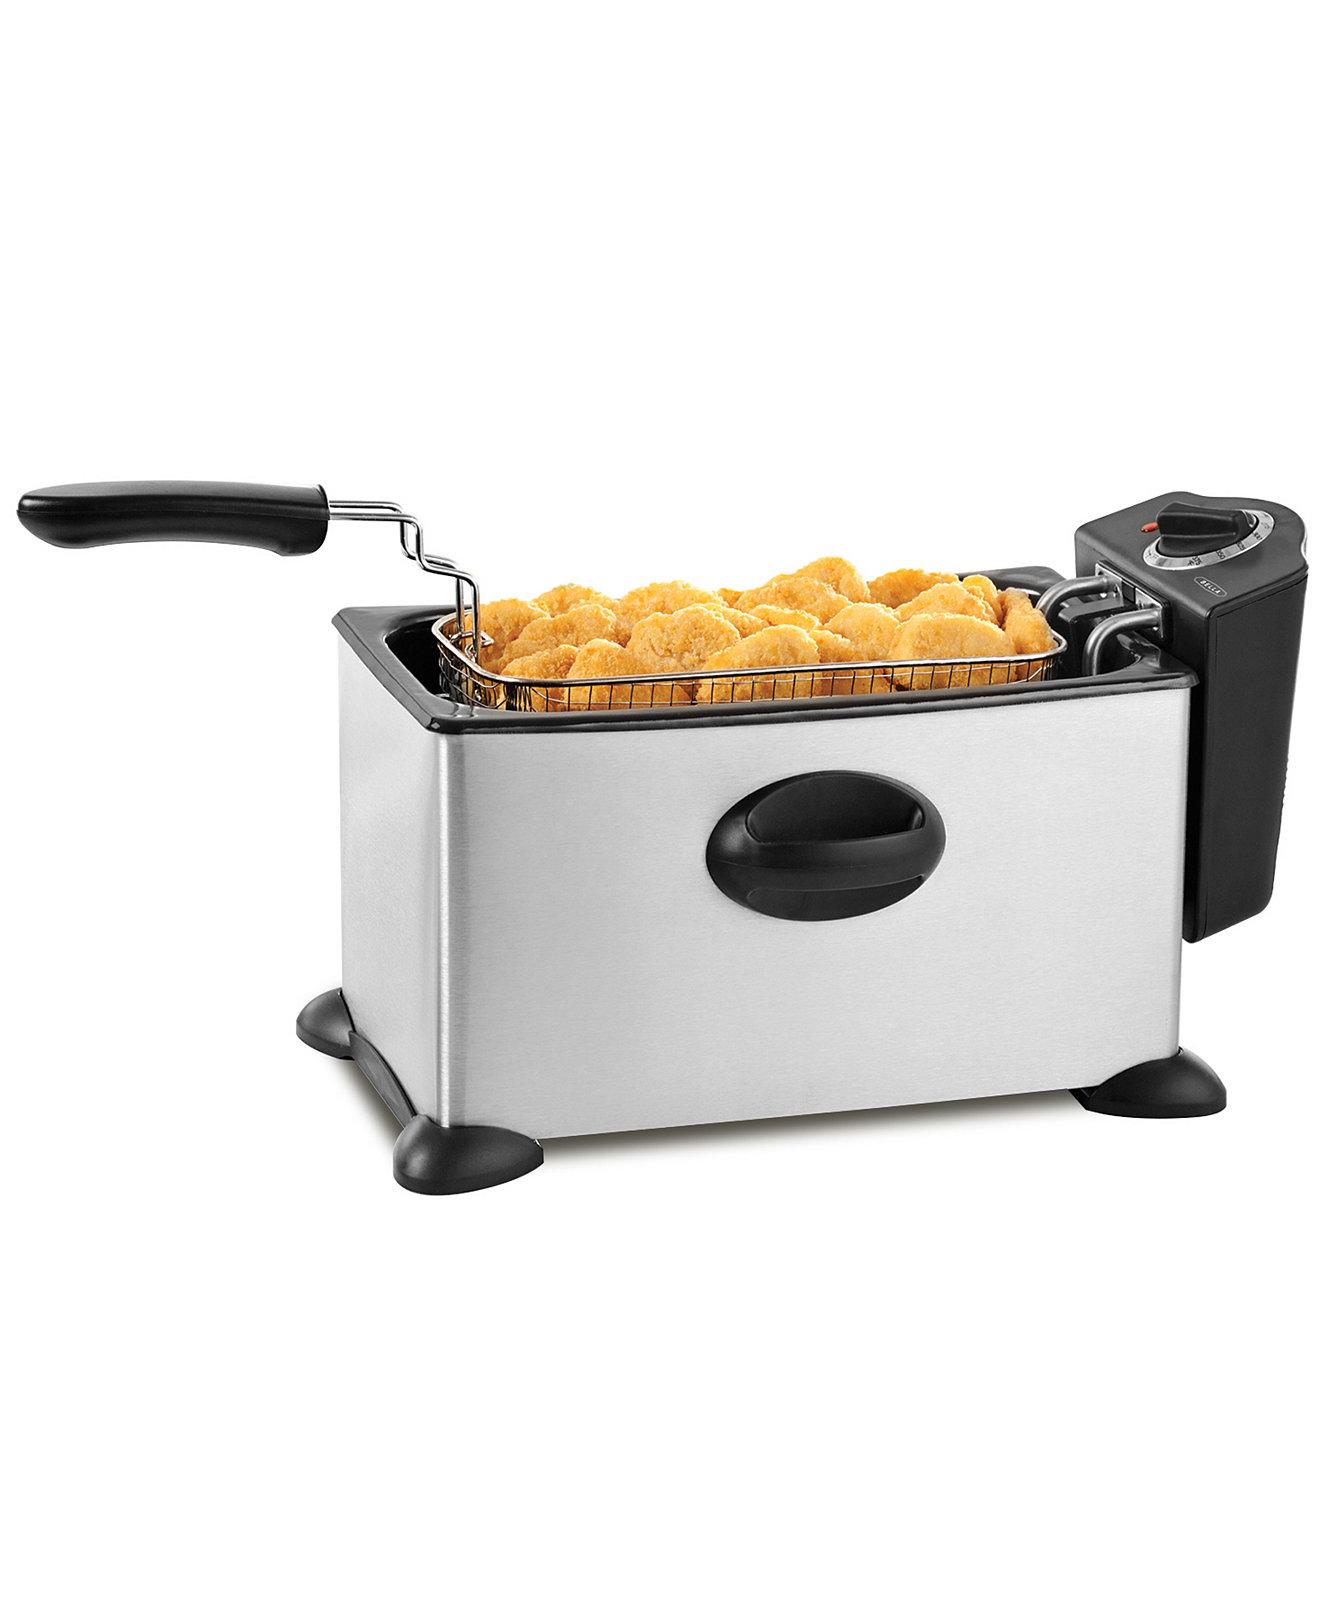 Macys Kitchen Appliances Bella 13401 35l Stainless Steel Deep Fryer Electrics Kitchen